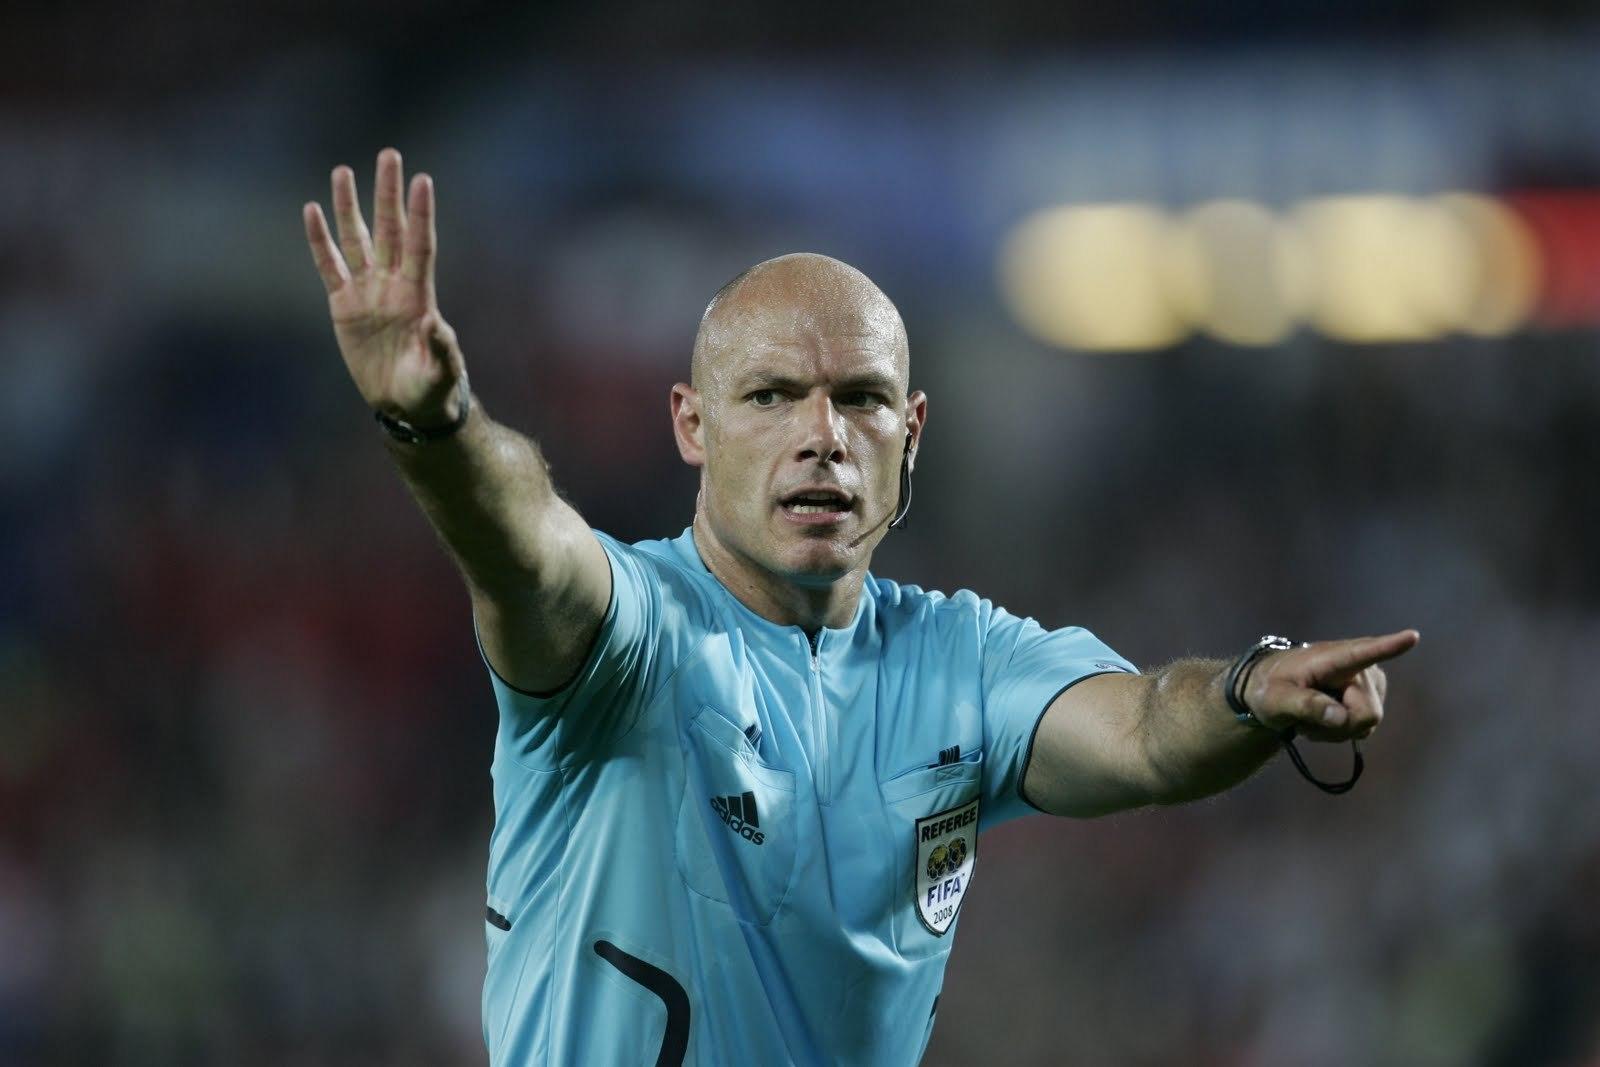 referees-at-work-cyburbia.jpg